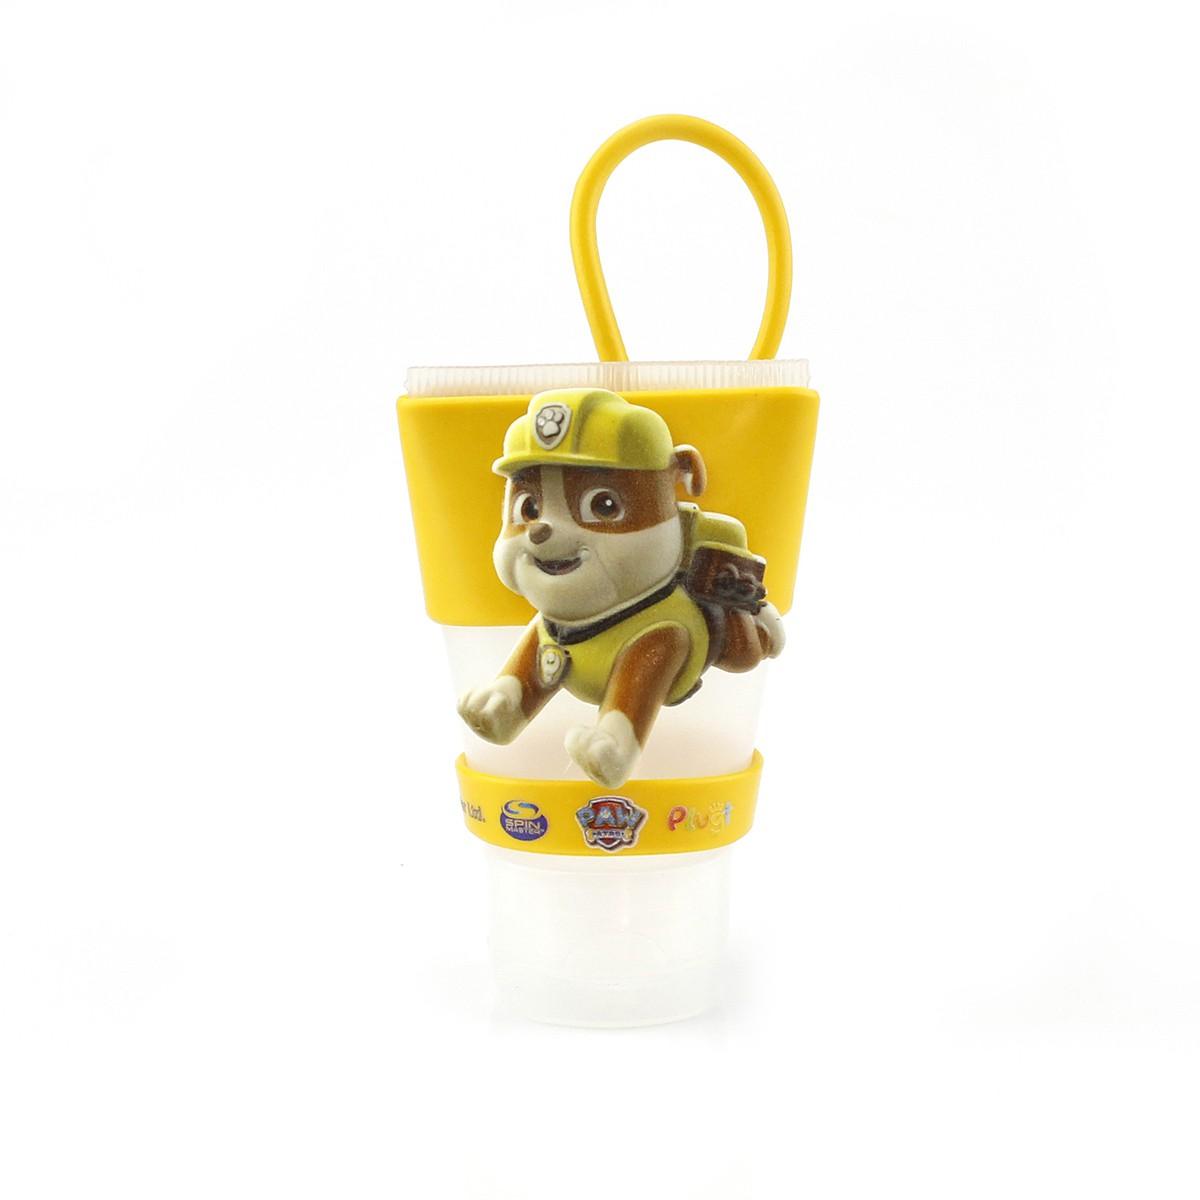 Chaveiro Plugt Patrulha Canina Rubble Amarelo + Frasco 30ml